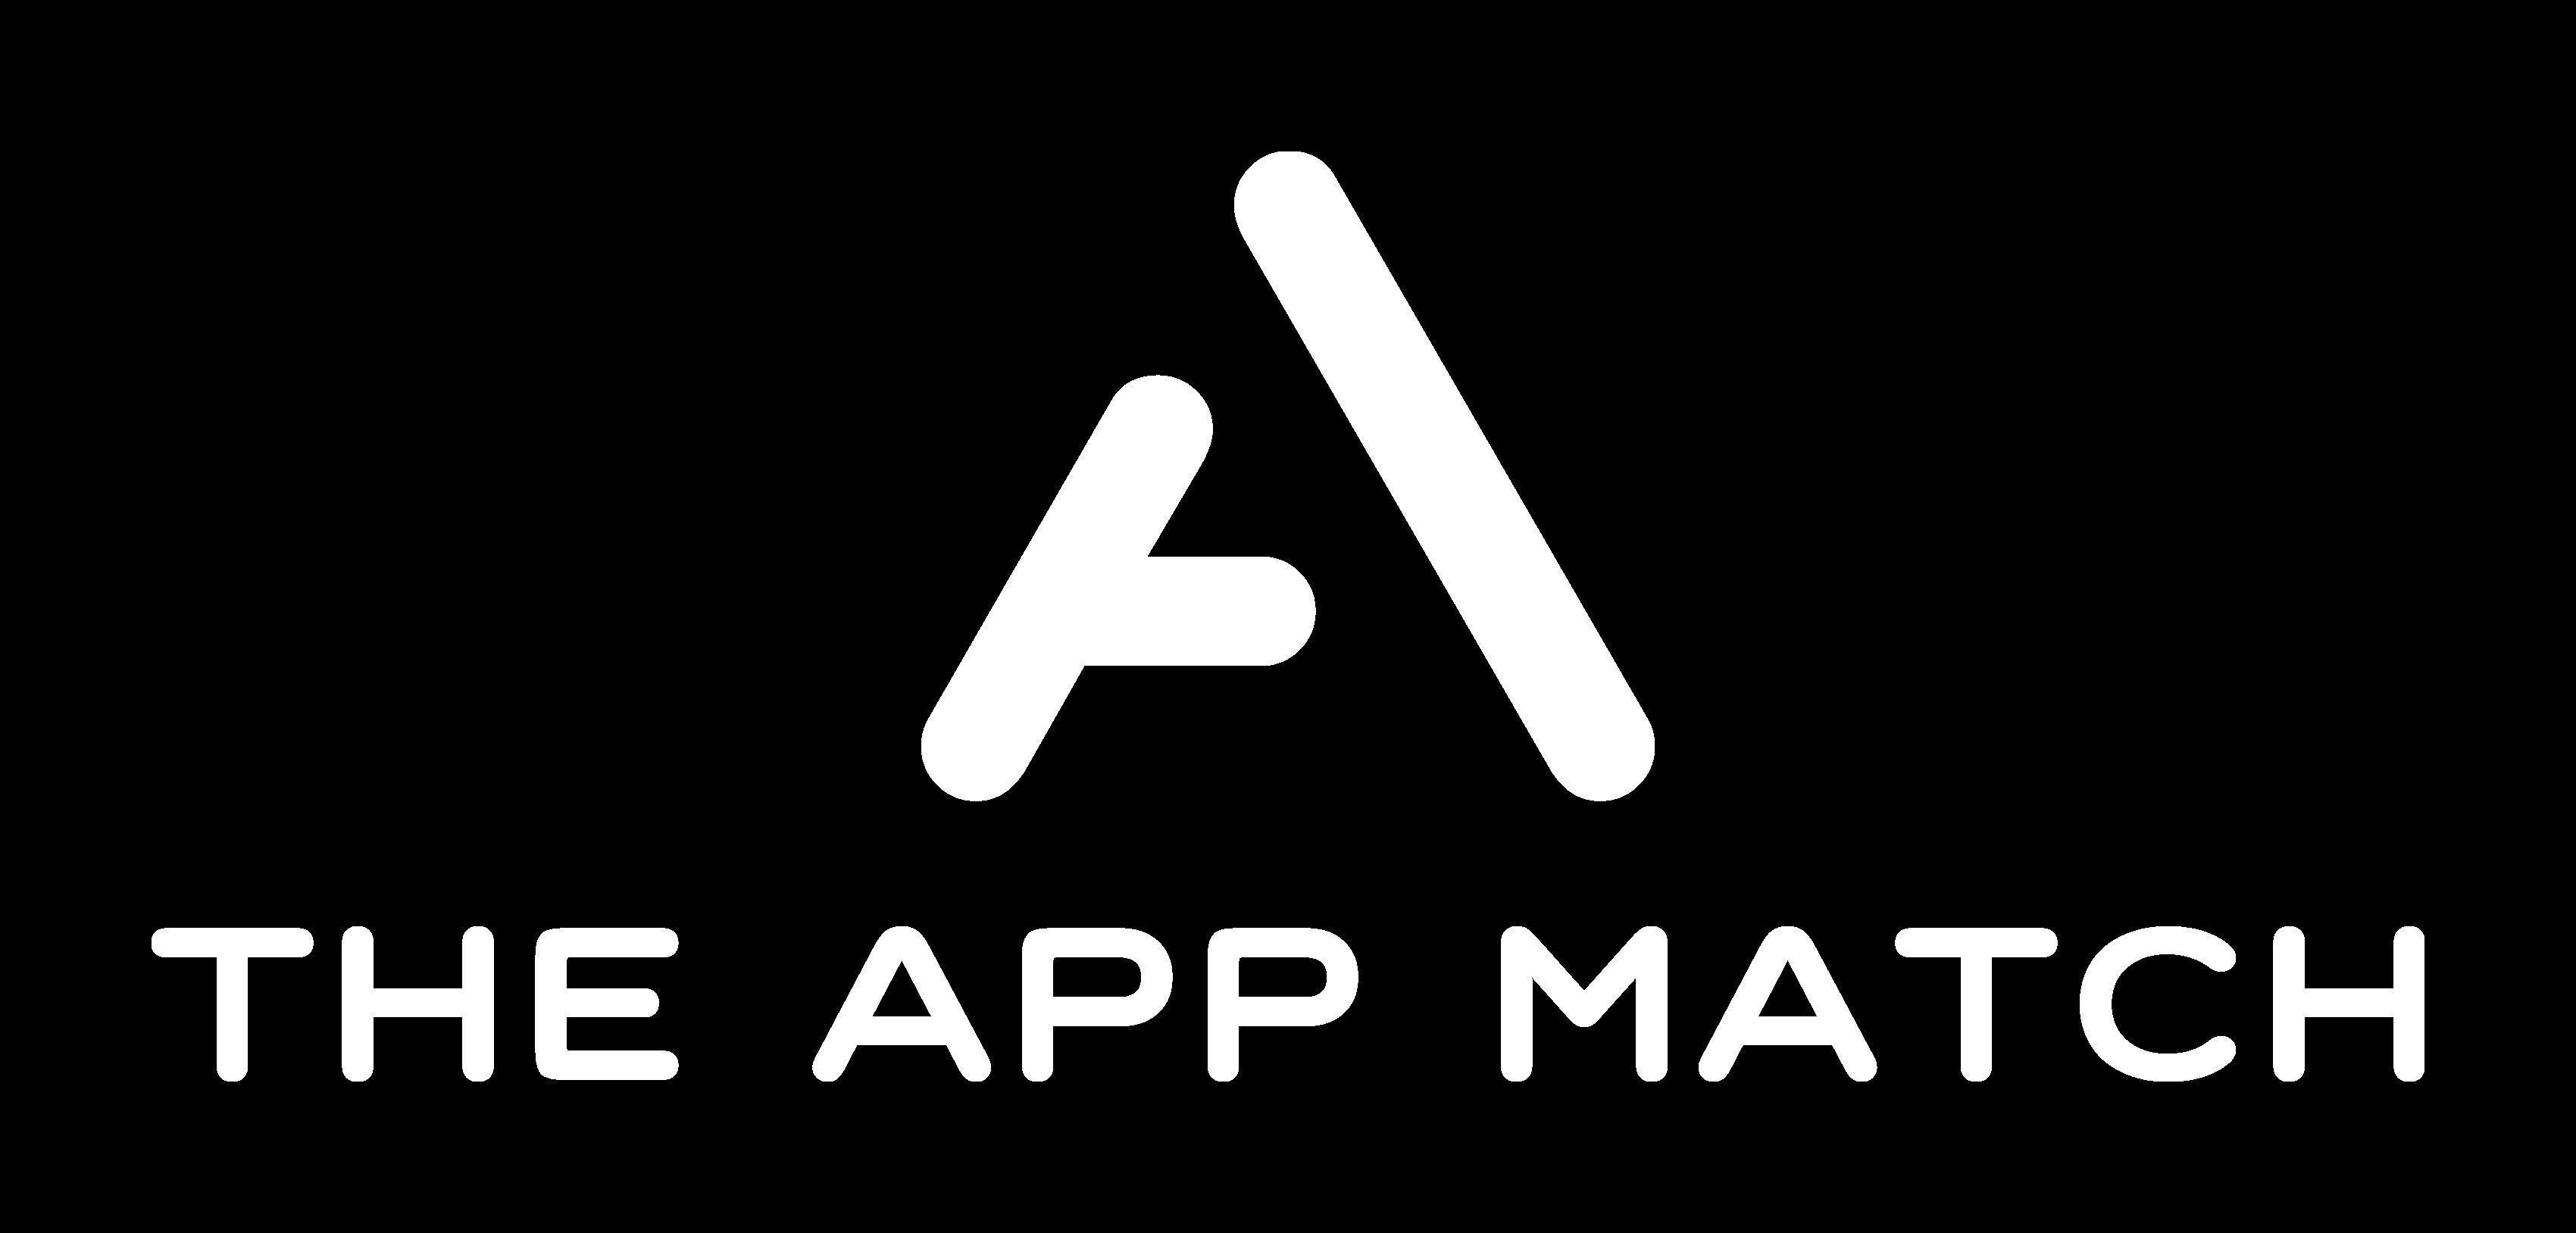 The App Match